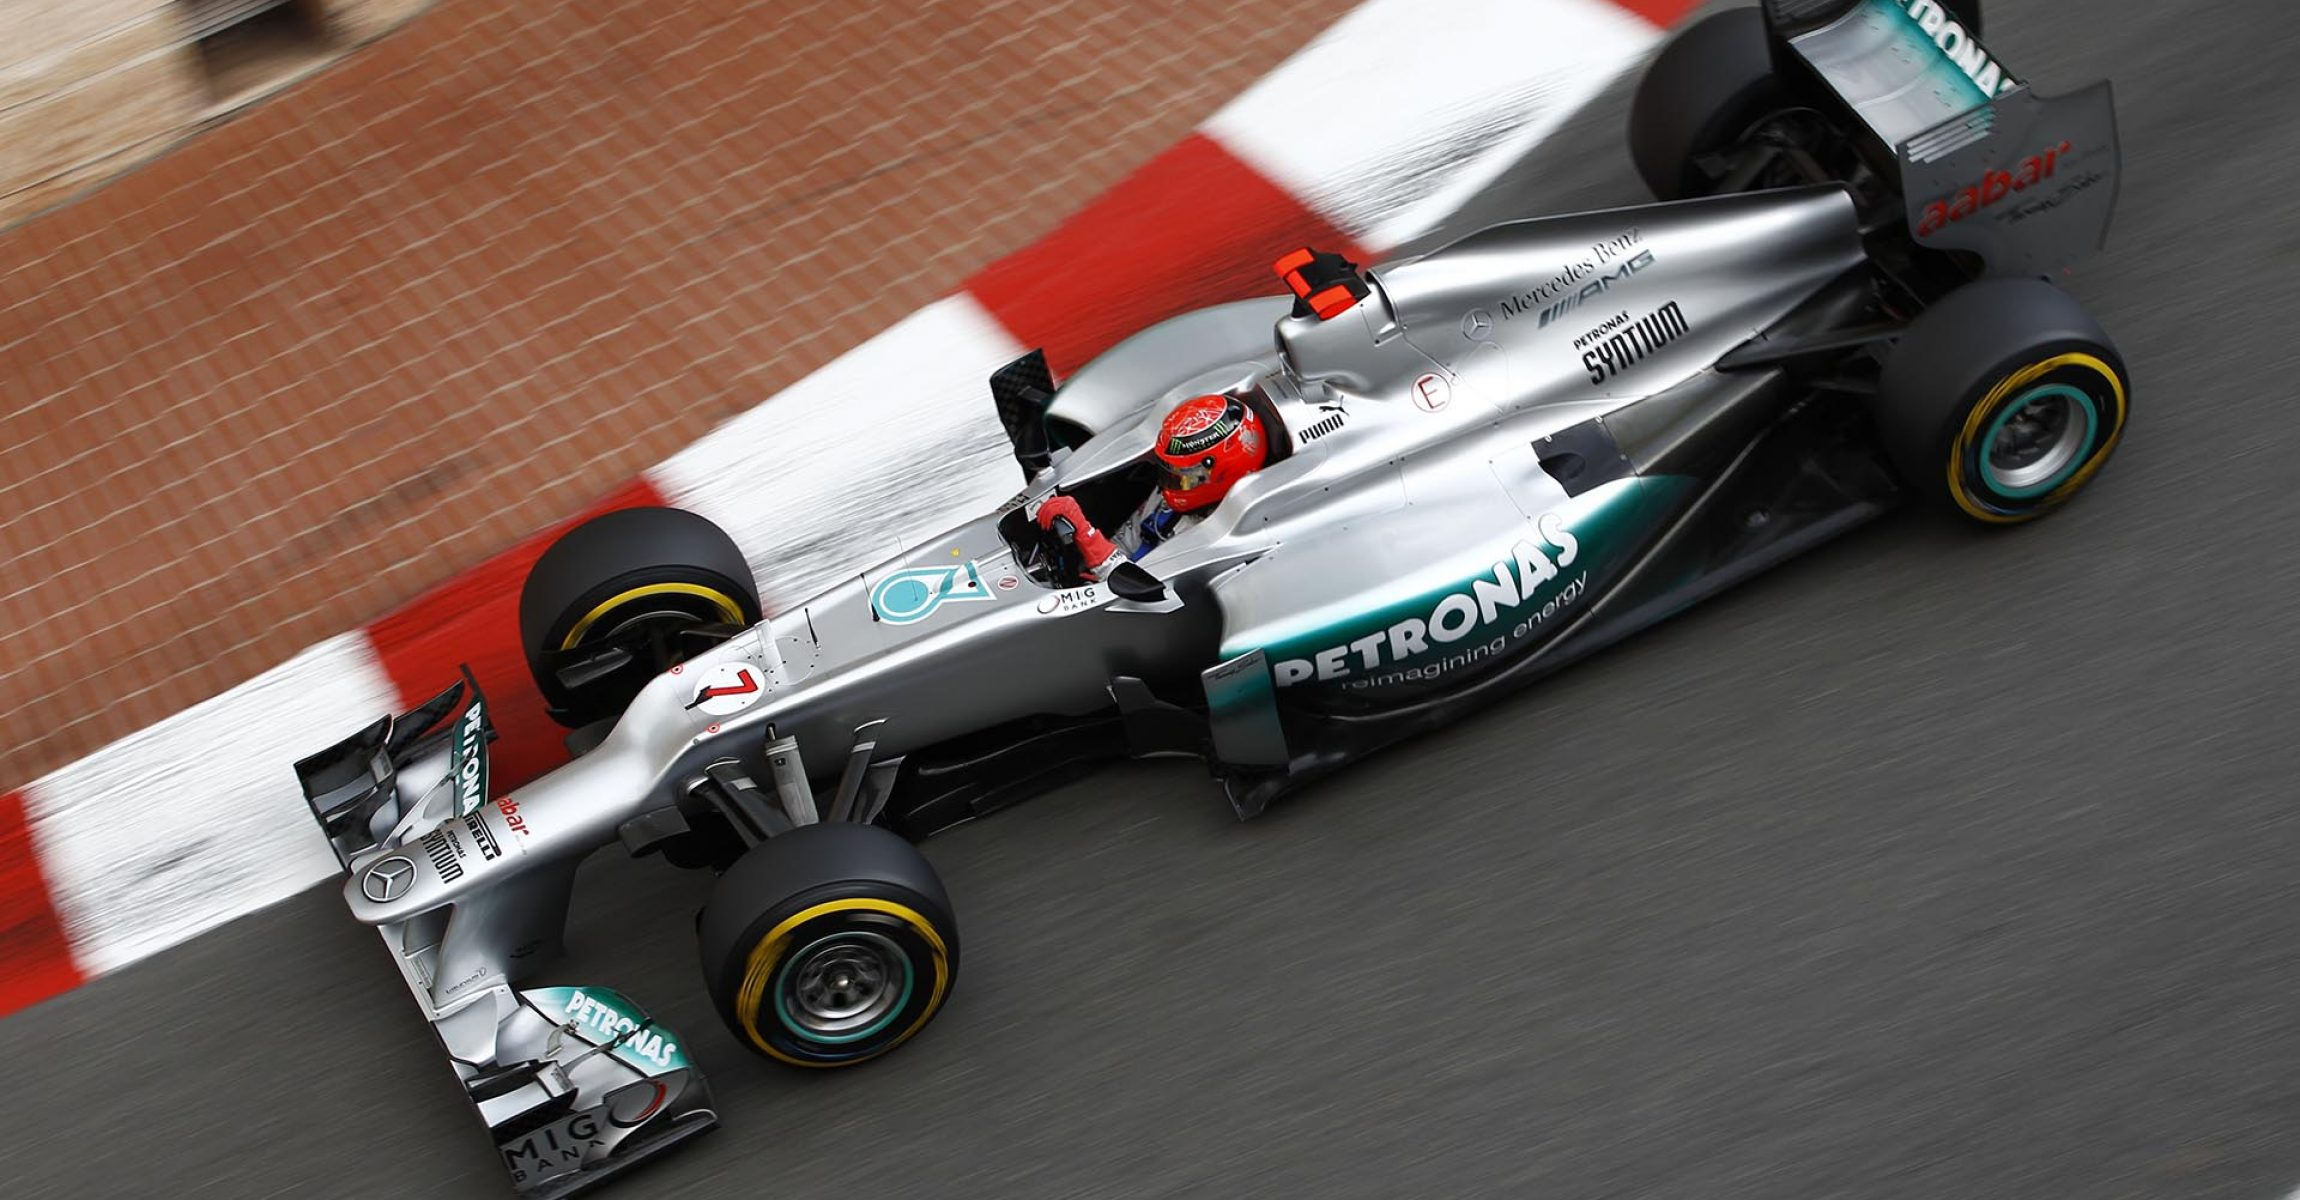 Michael Schumacher #7# (GER), Mercedes AMG Petronas F1 Team (GER).Sixth race 2012 Formula one Monaco Grand Prix, Monte carlo. Photo: activepictures/jiri krenek 2012 Monaco Grand Prix, Thursday - Wolfgang Wilhelm